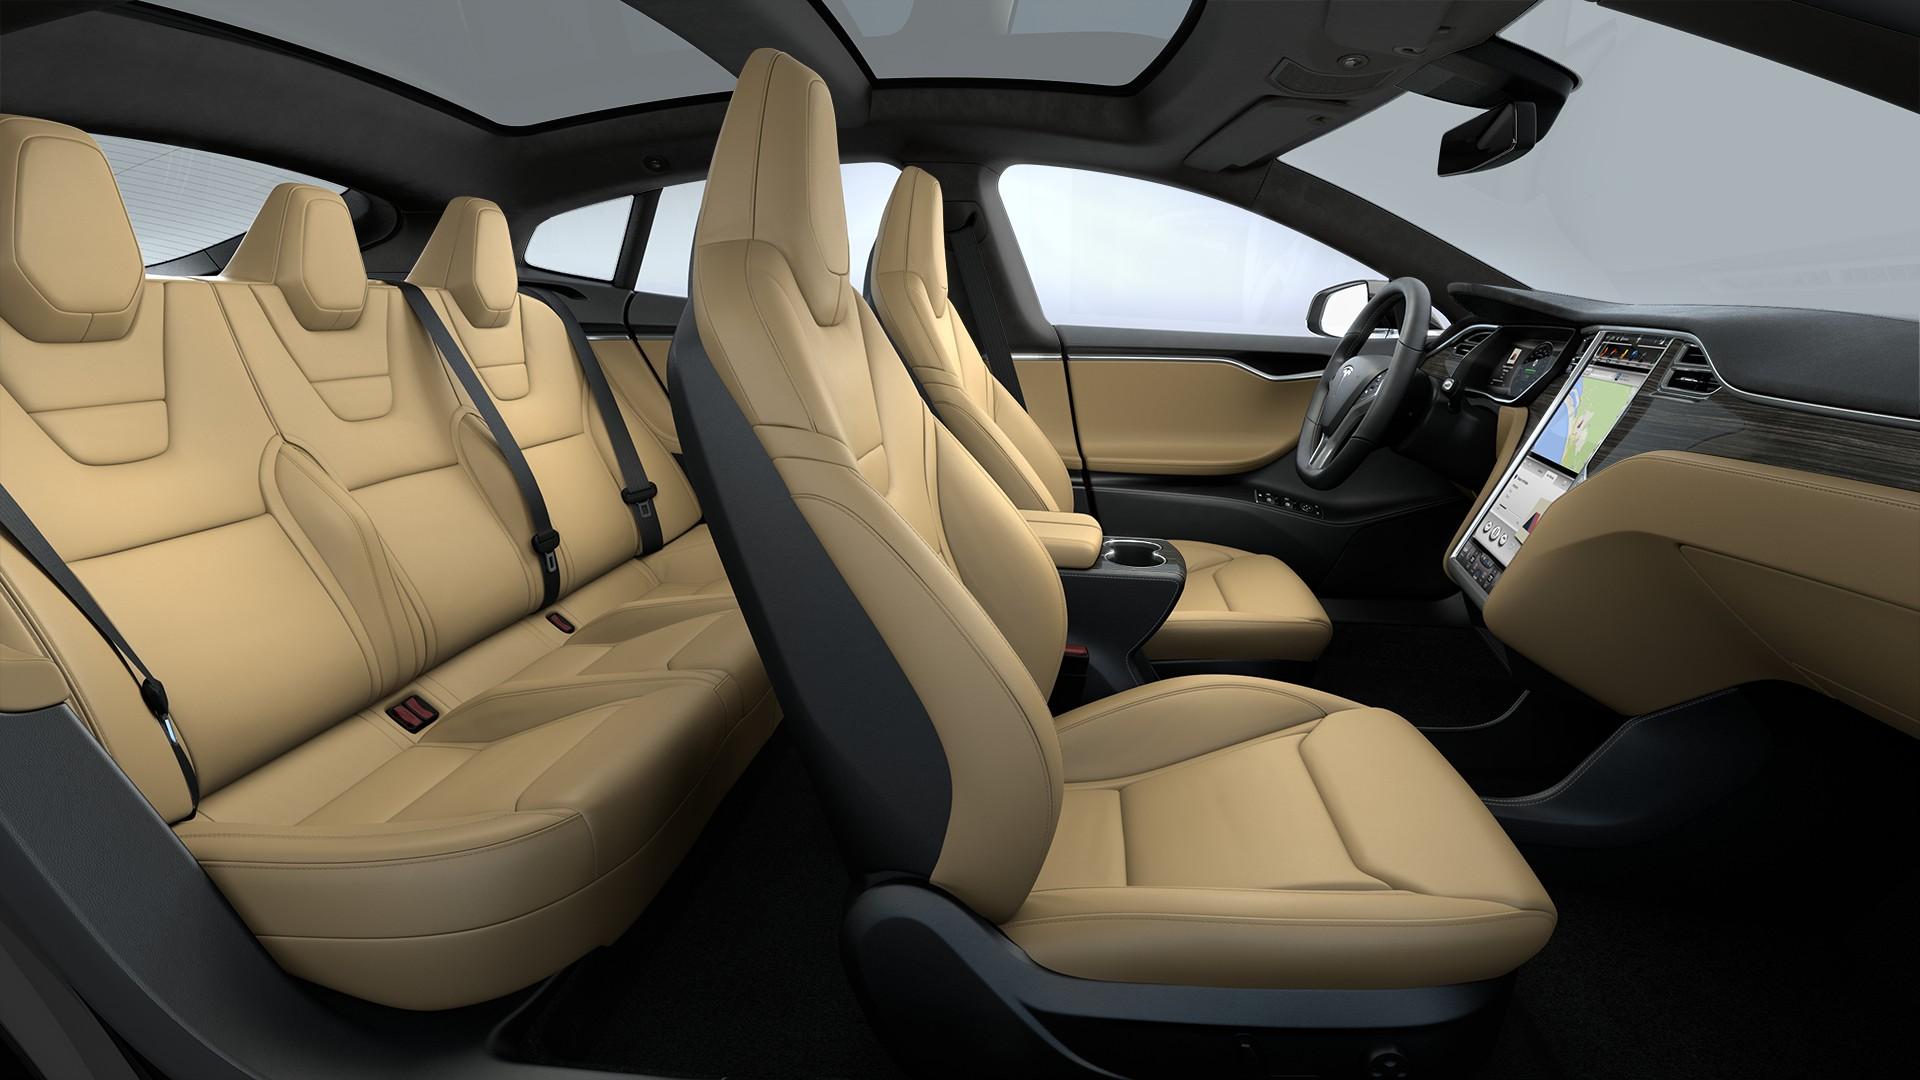 Interieur Extended Nappa Leather Trim Black Alcantara Headliner Alcantara Dashboard Accents